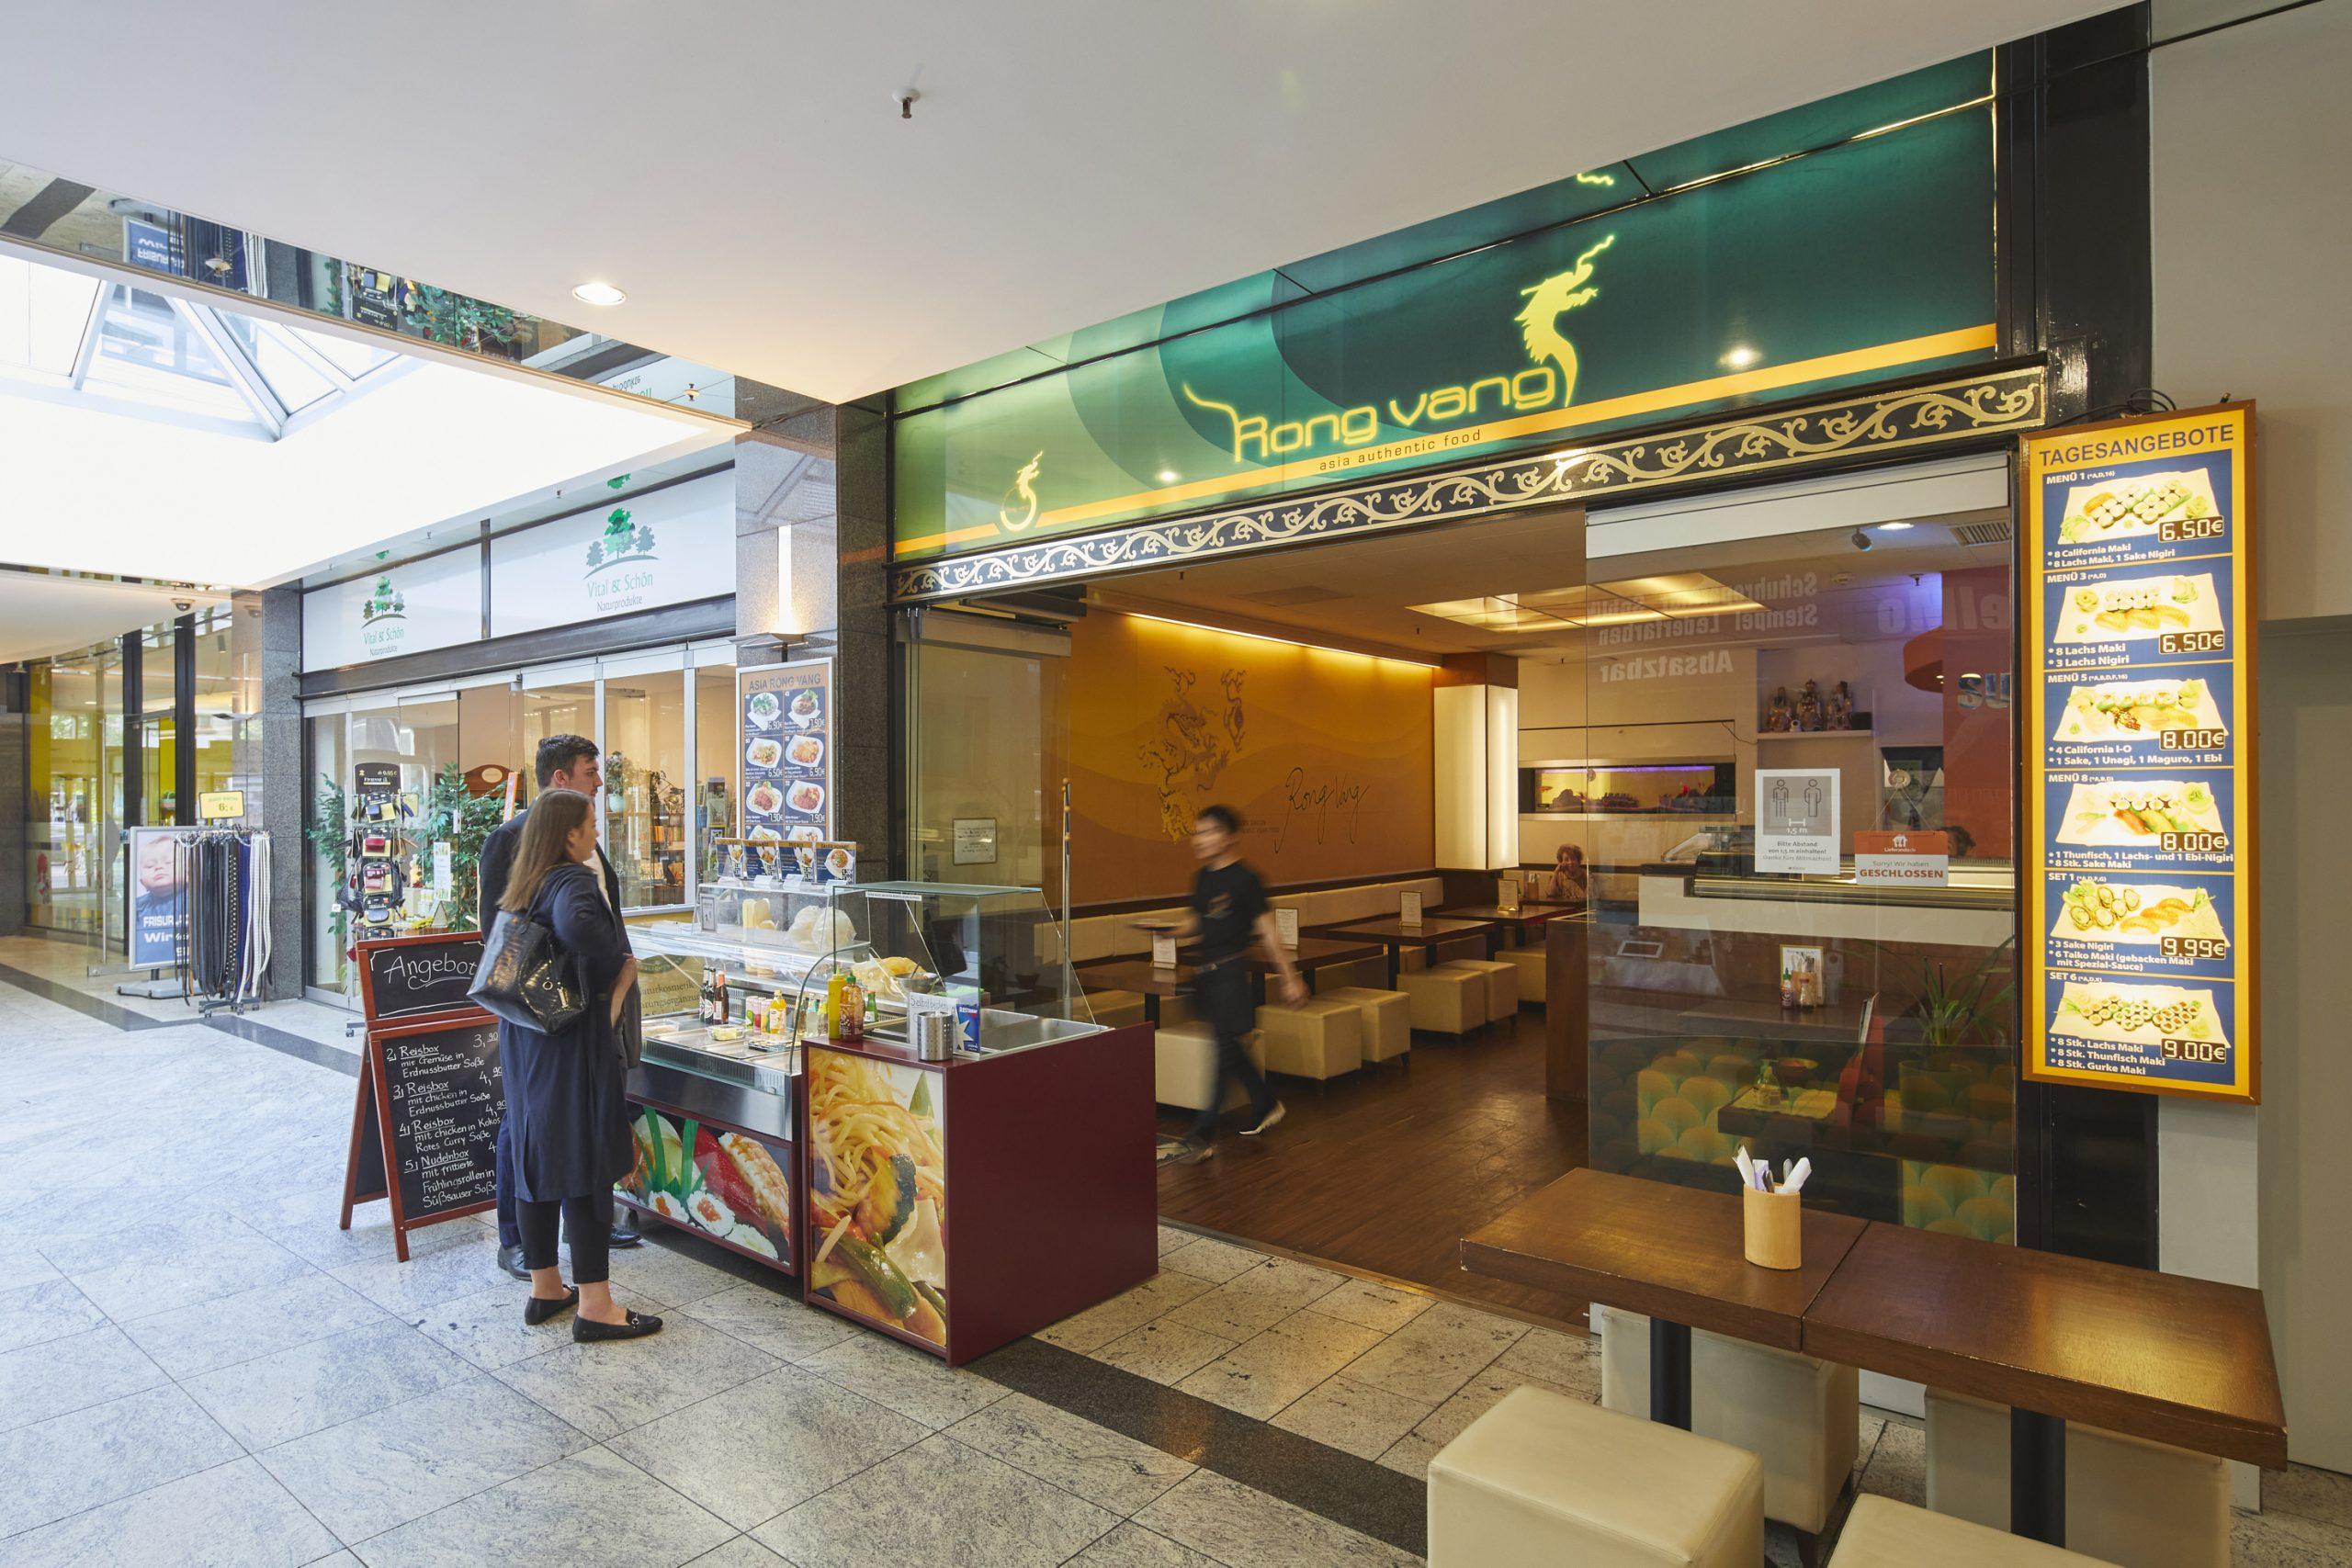 Sushi Restaurant Asia Rong Vang im Plaza Frankfurter Allee Berlin